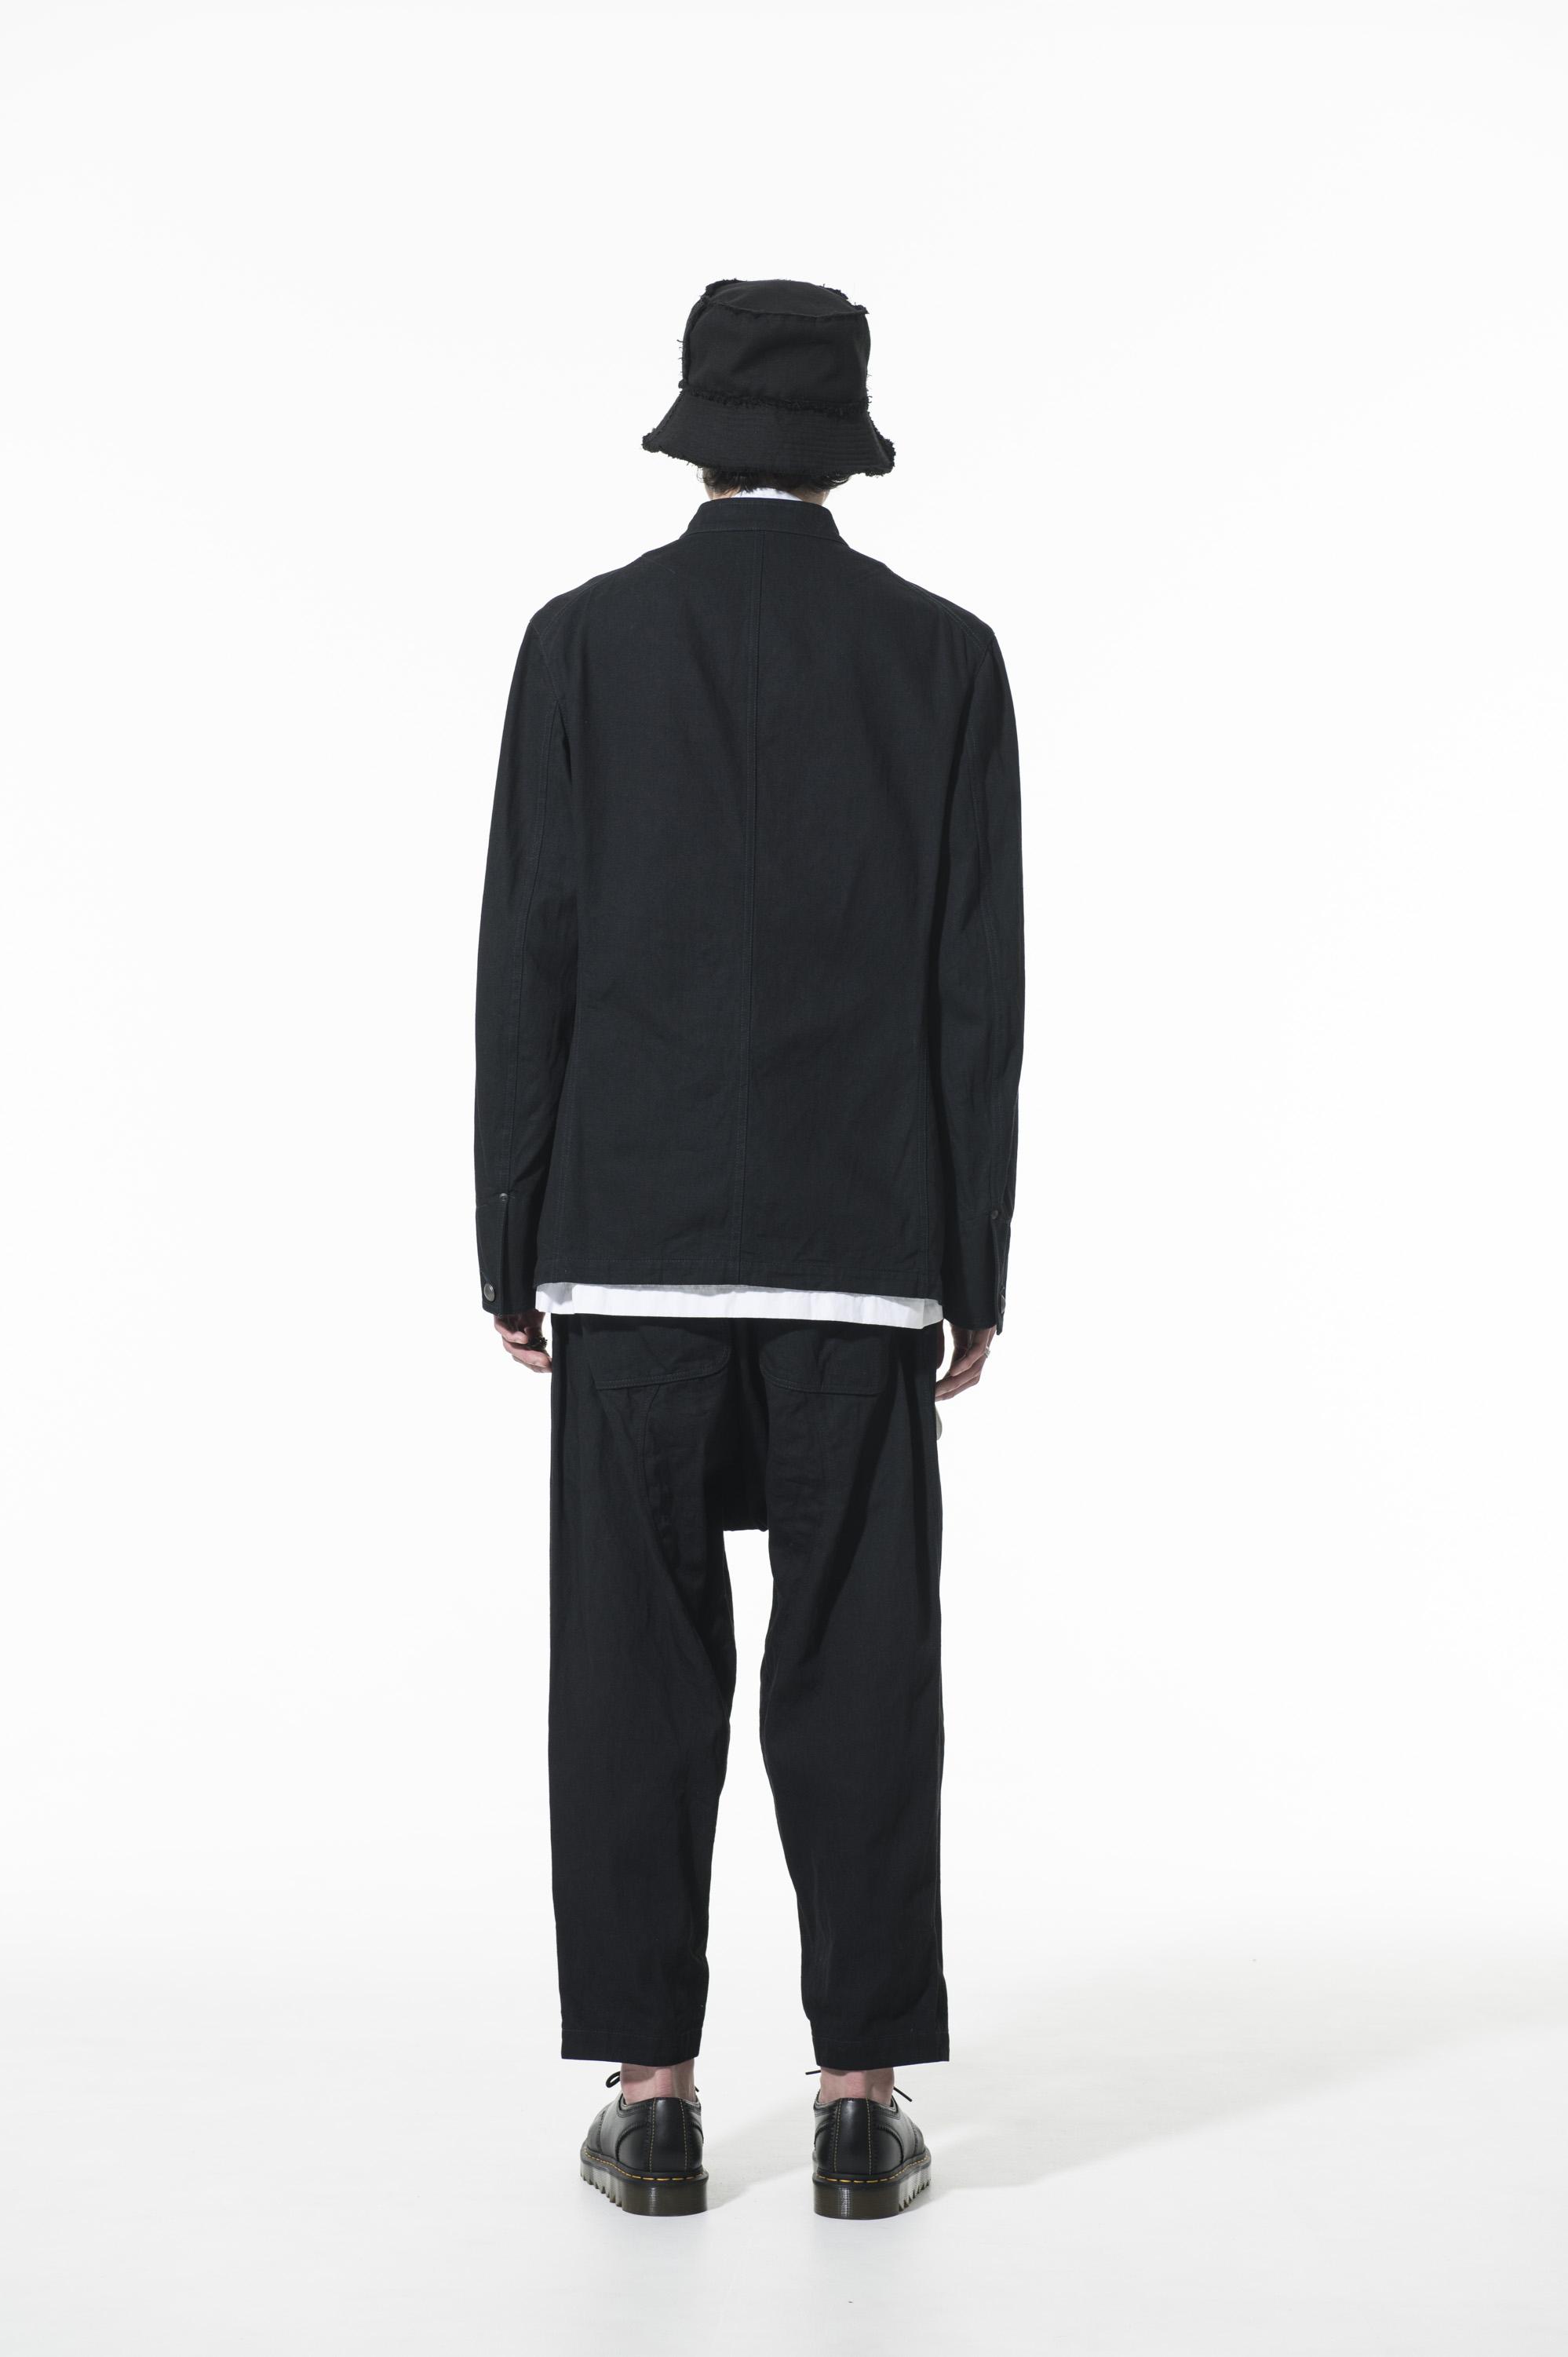 10 oz Denim stand collar Coveralls Jacket